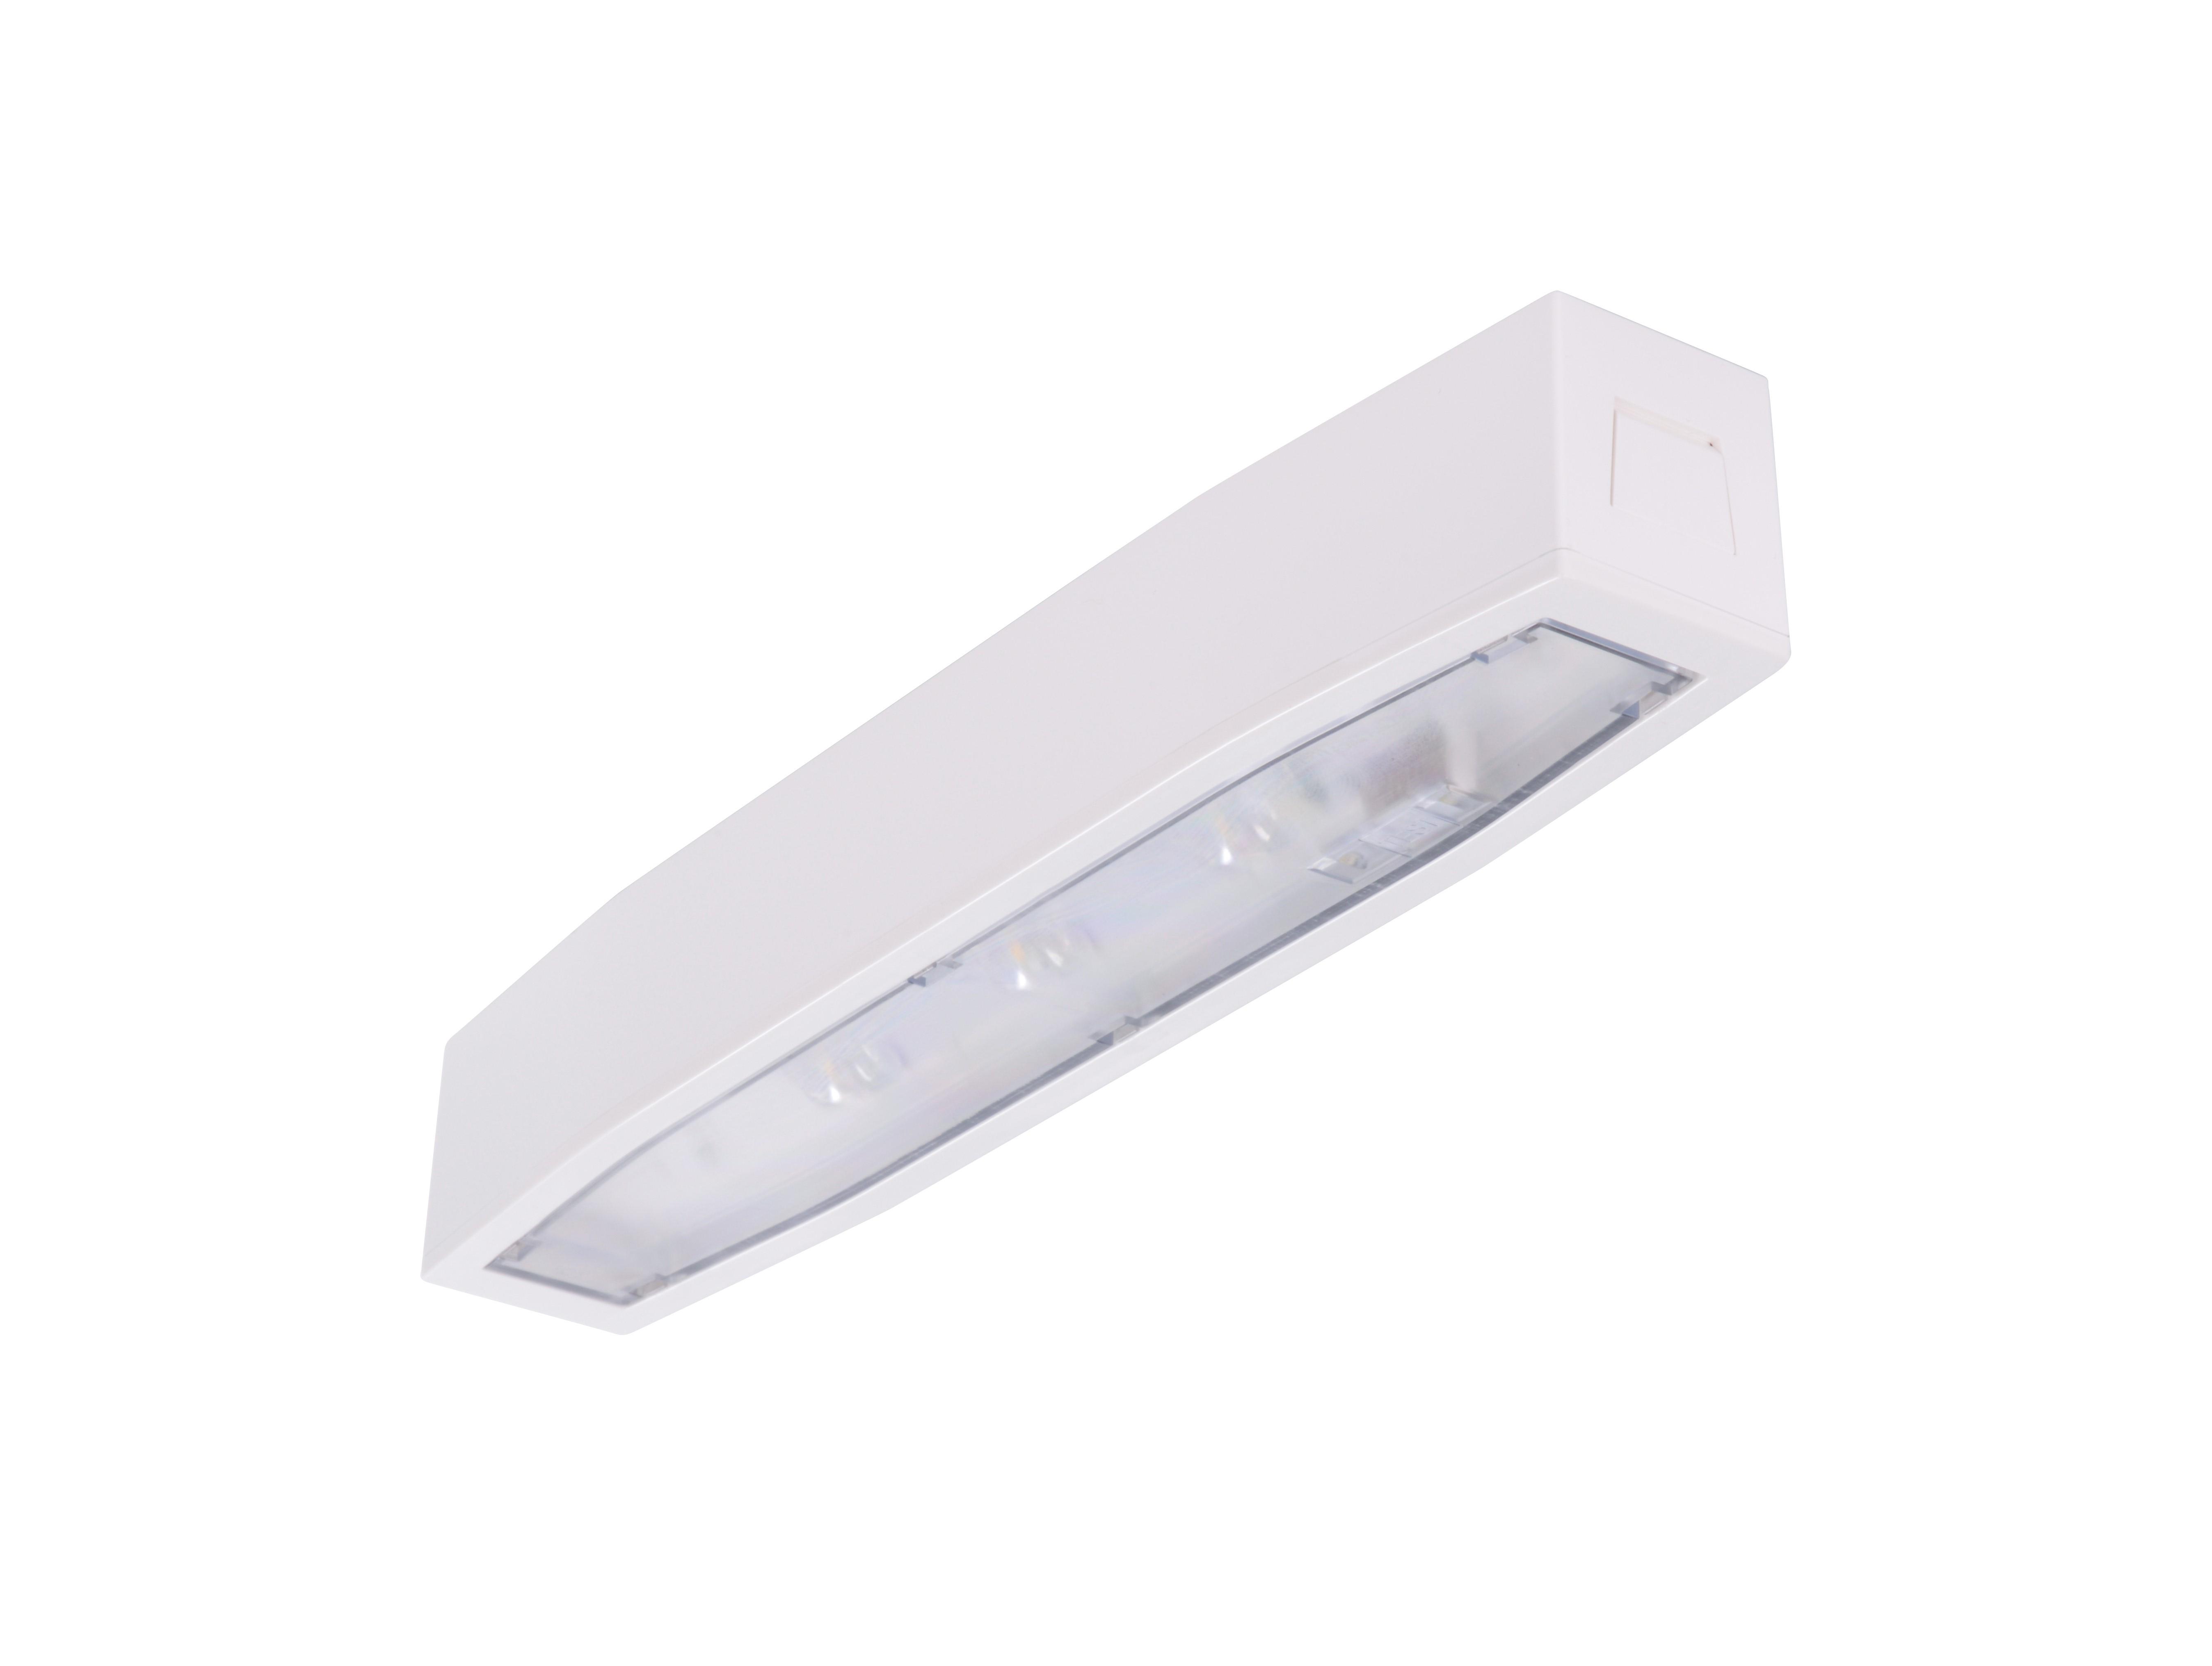 Lampa emergenta led Intelight 94717   3h nementinut test automat0